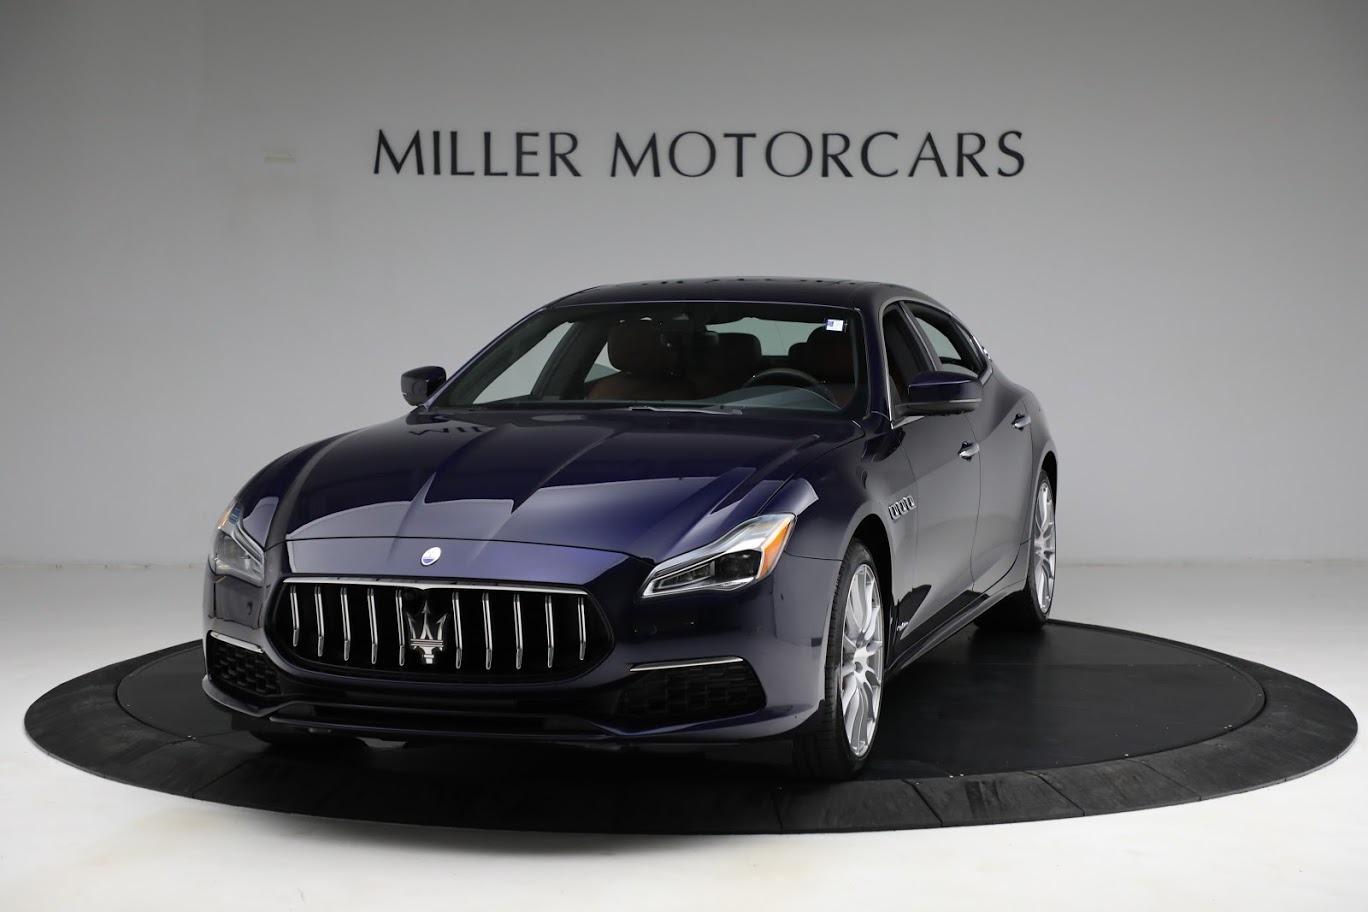 New 2021 Maserati Quattroporte S Q4 GranLusso for sale Call for price at Pagani of Greenwich in Greenwich CT 06830 1